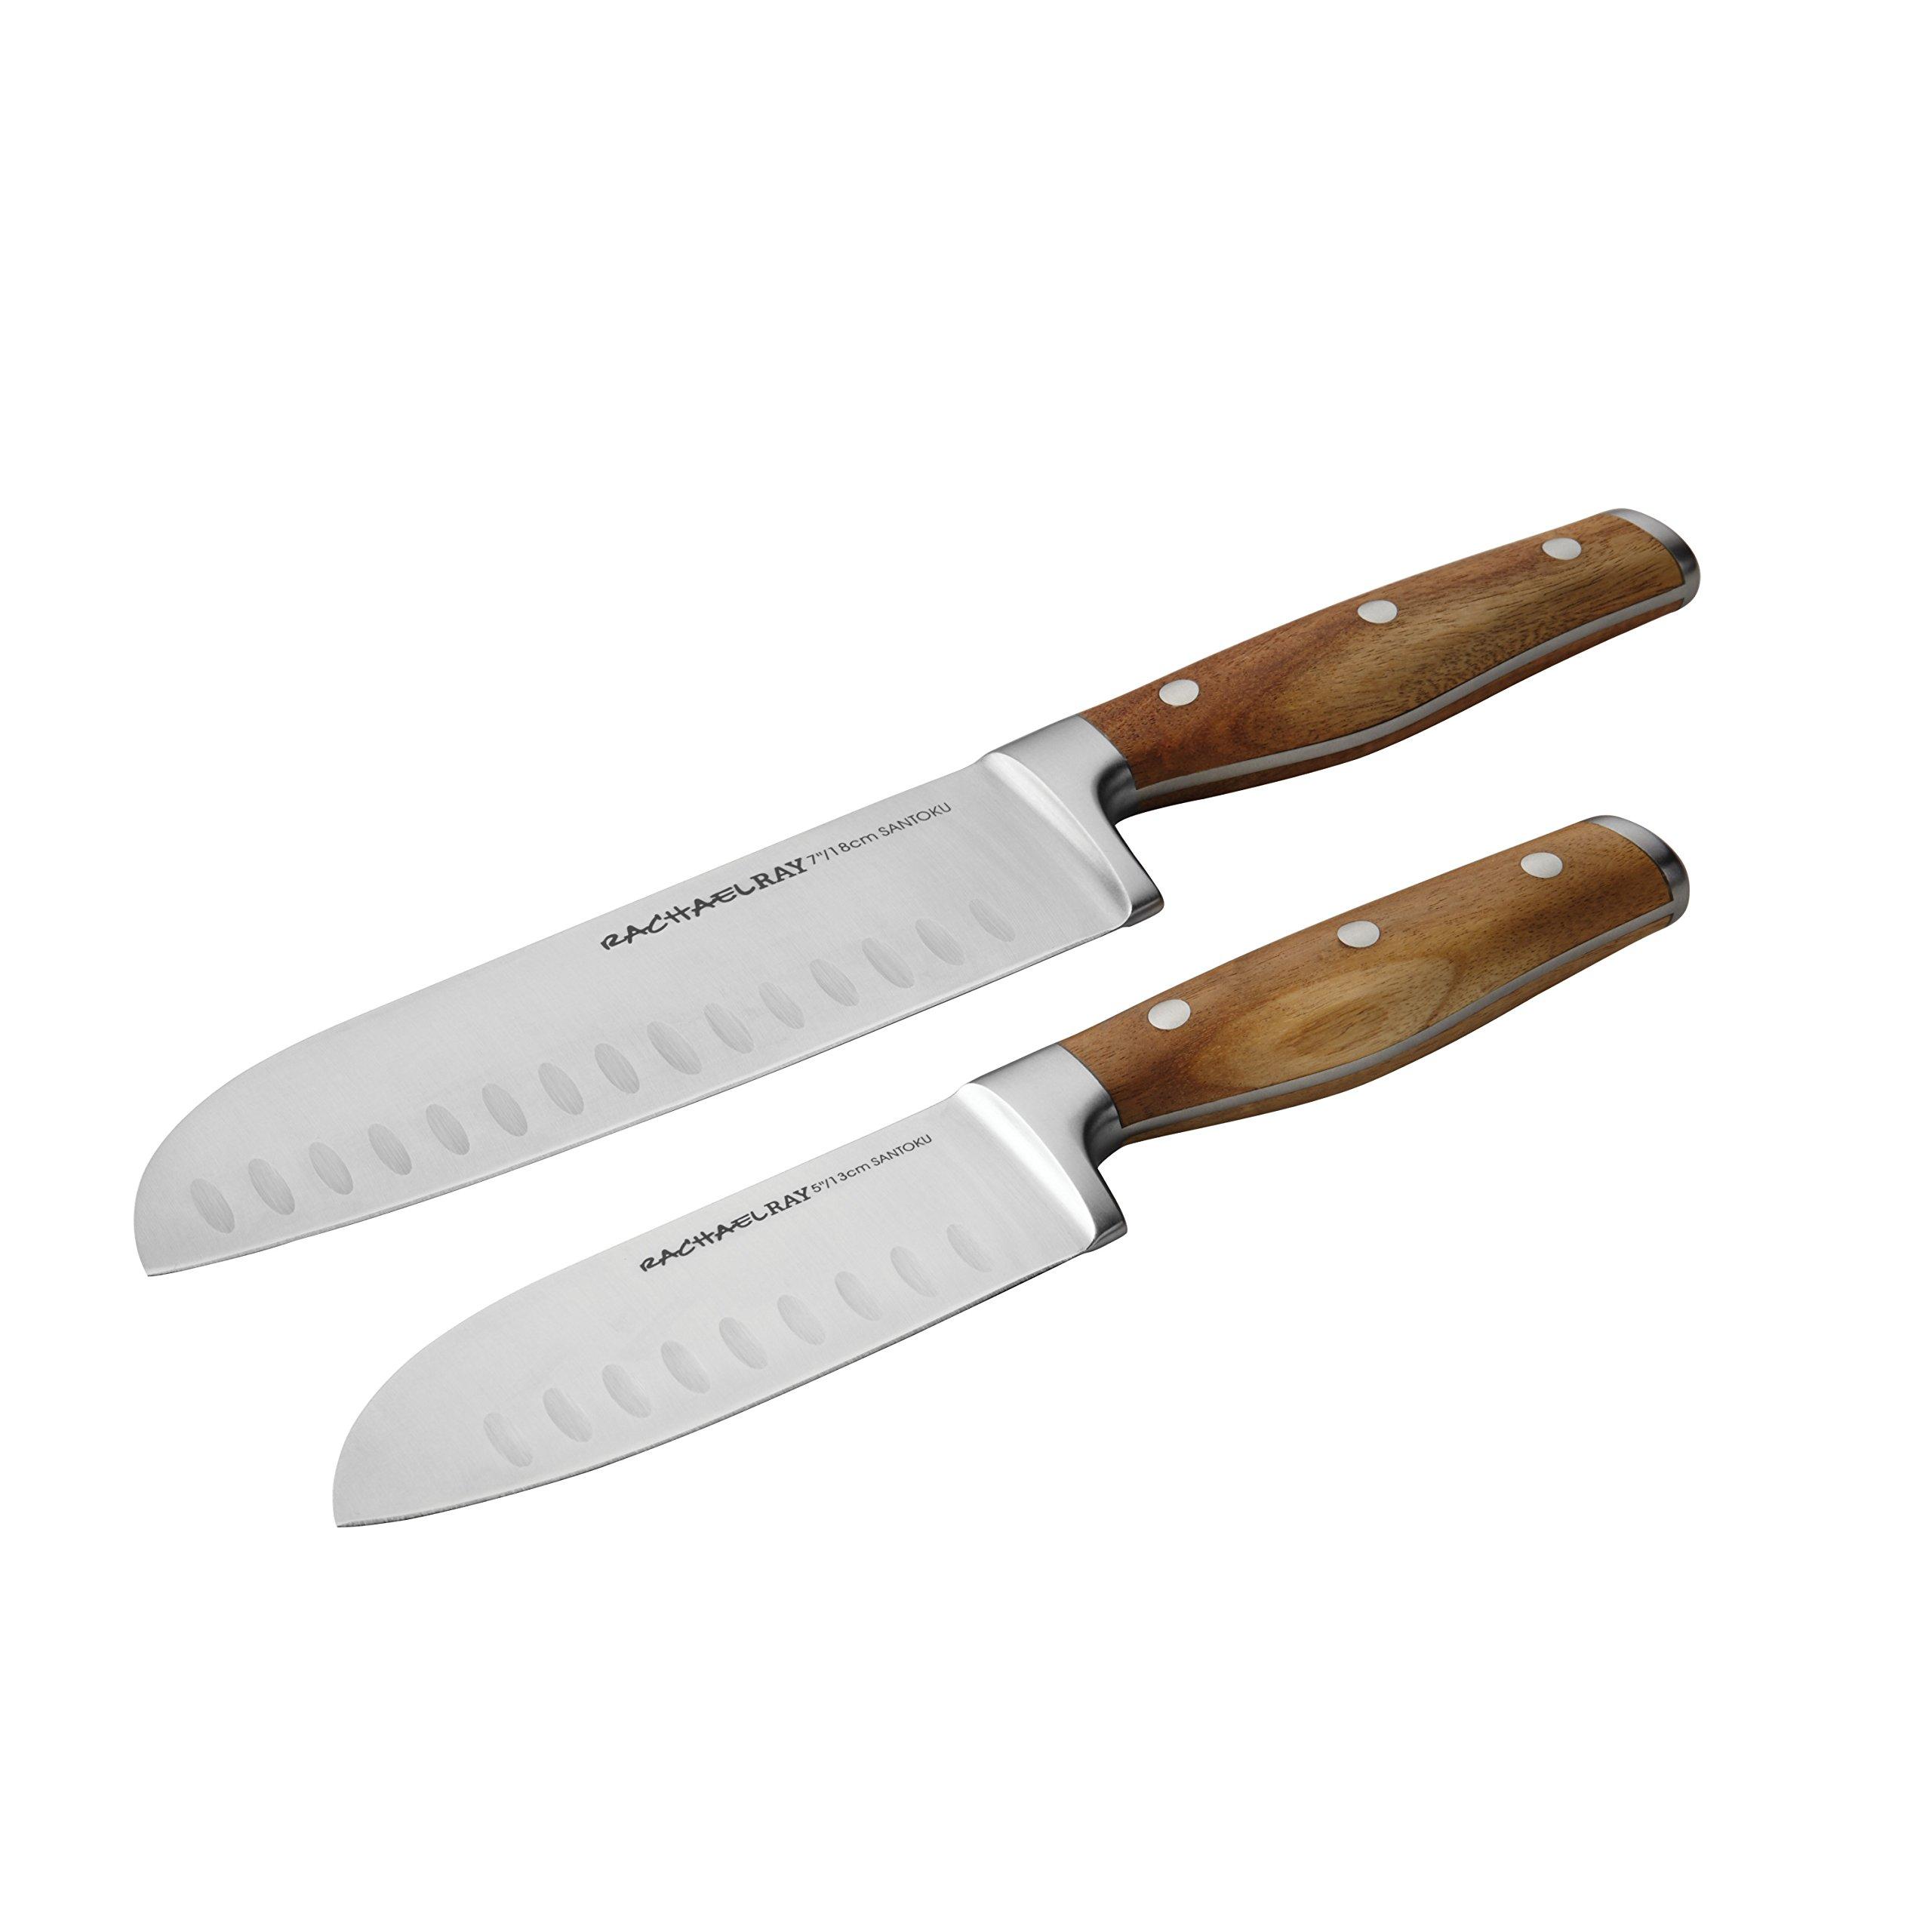 Rachael Ray Cucina Cutlery 2-Piece Japanese Stainless Steel Santoku Knife Set with Acacia Handles - 50707,Acacia Wood